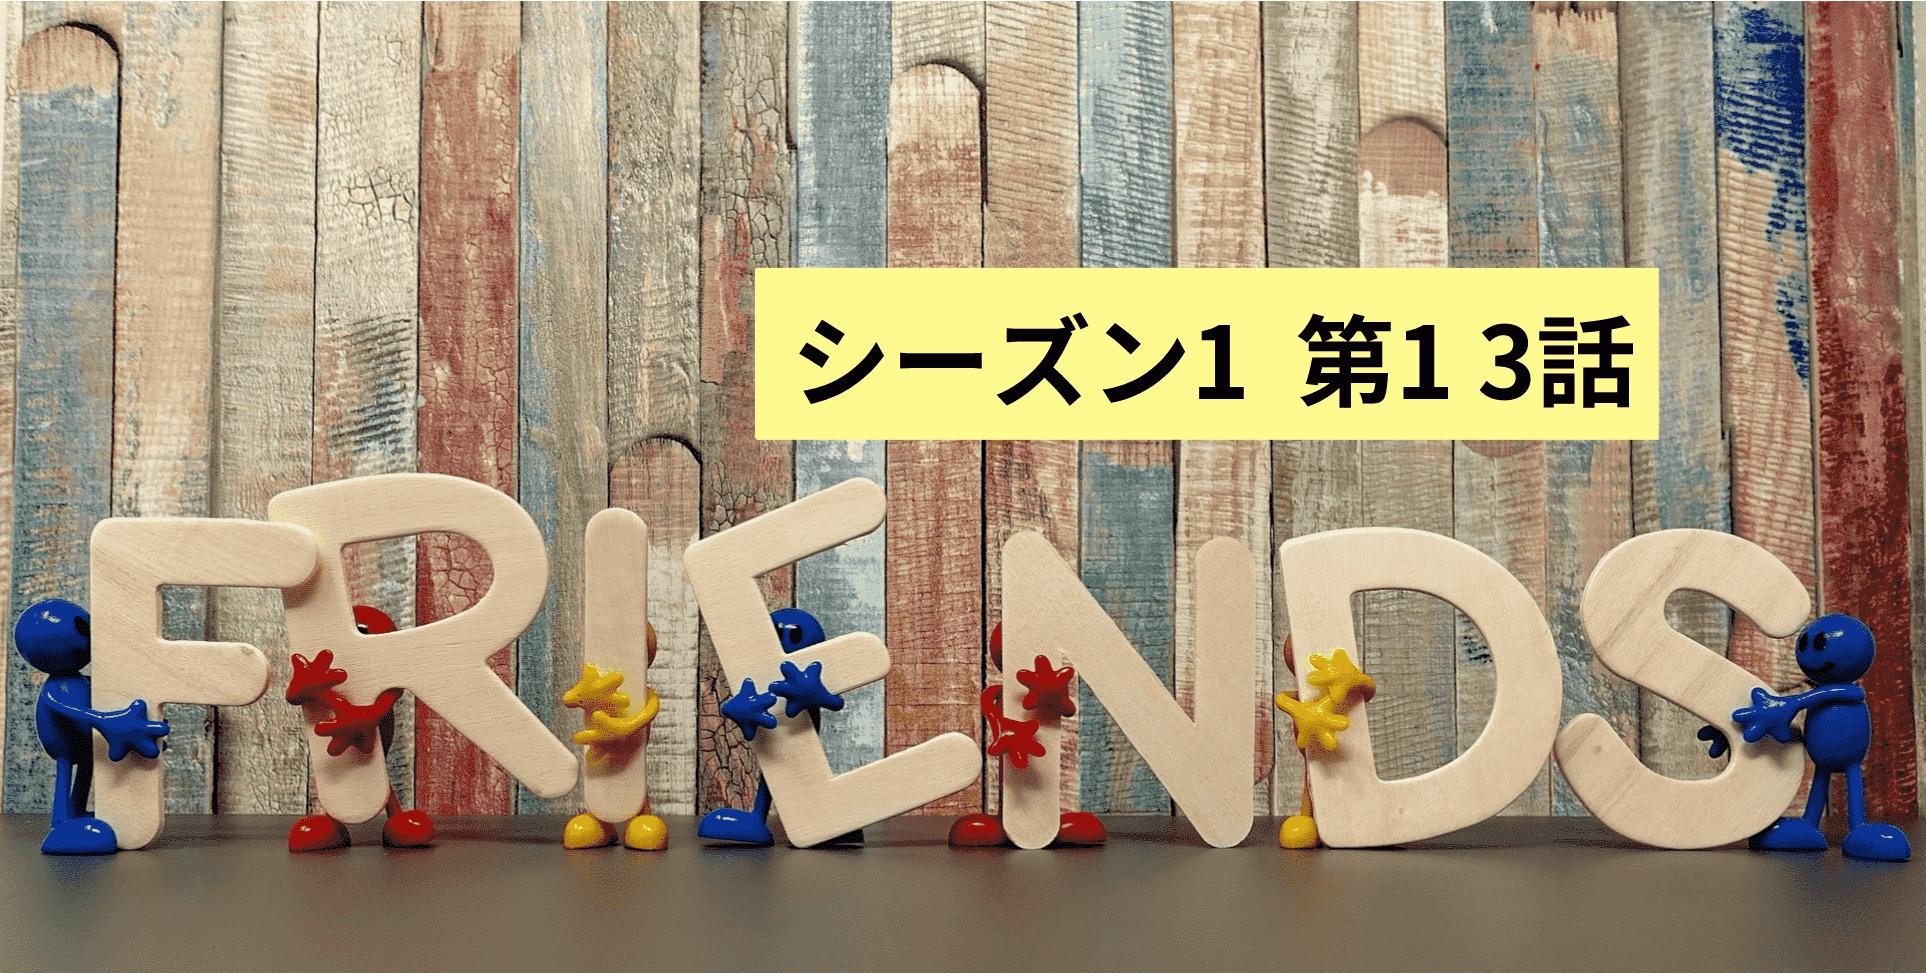 friends1-13